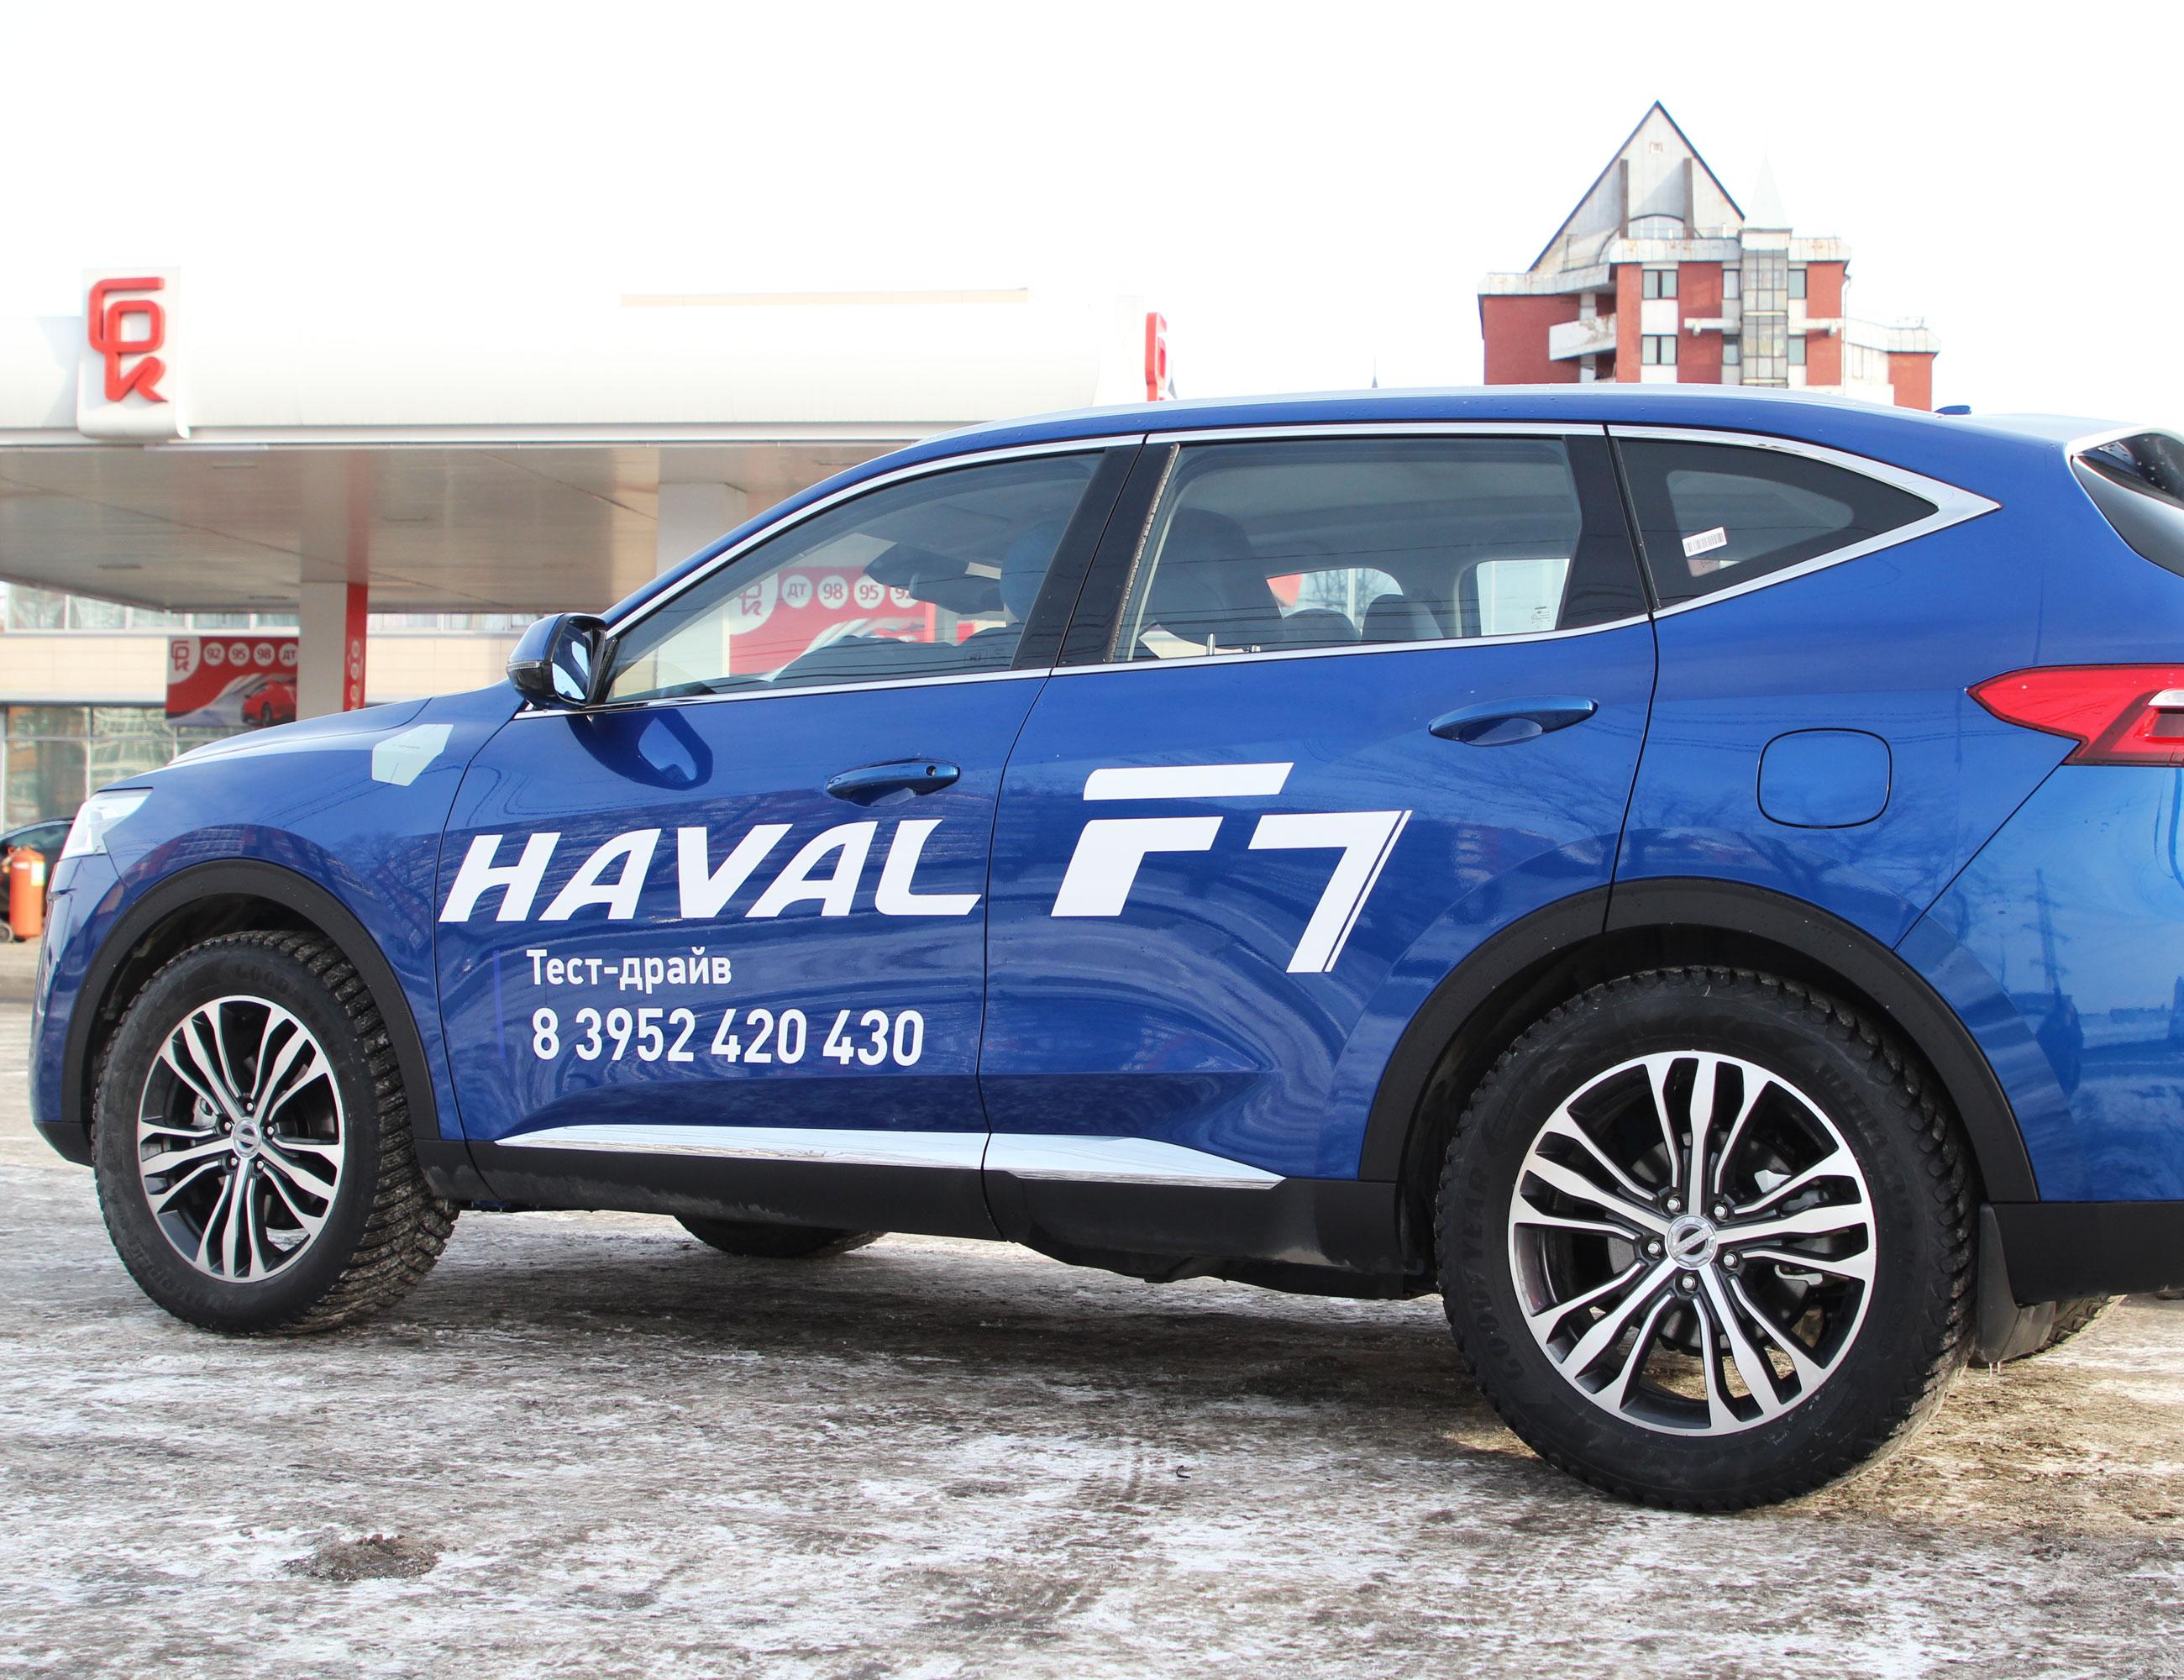 Haval F7